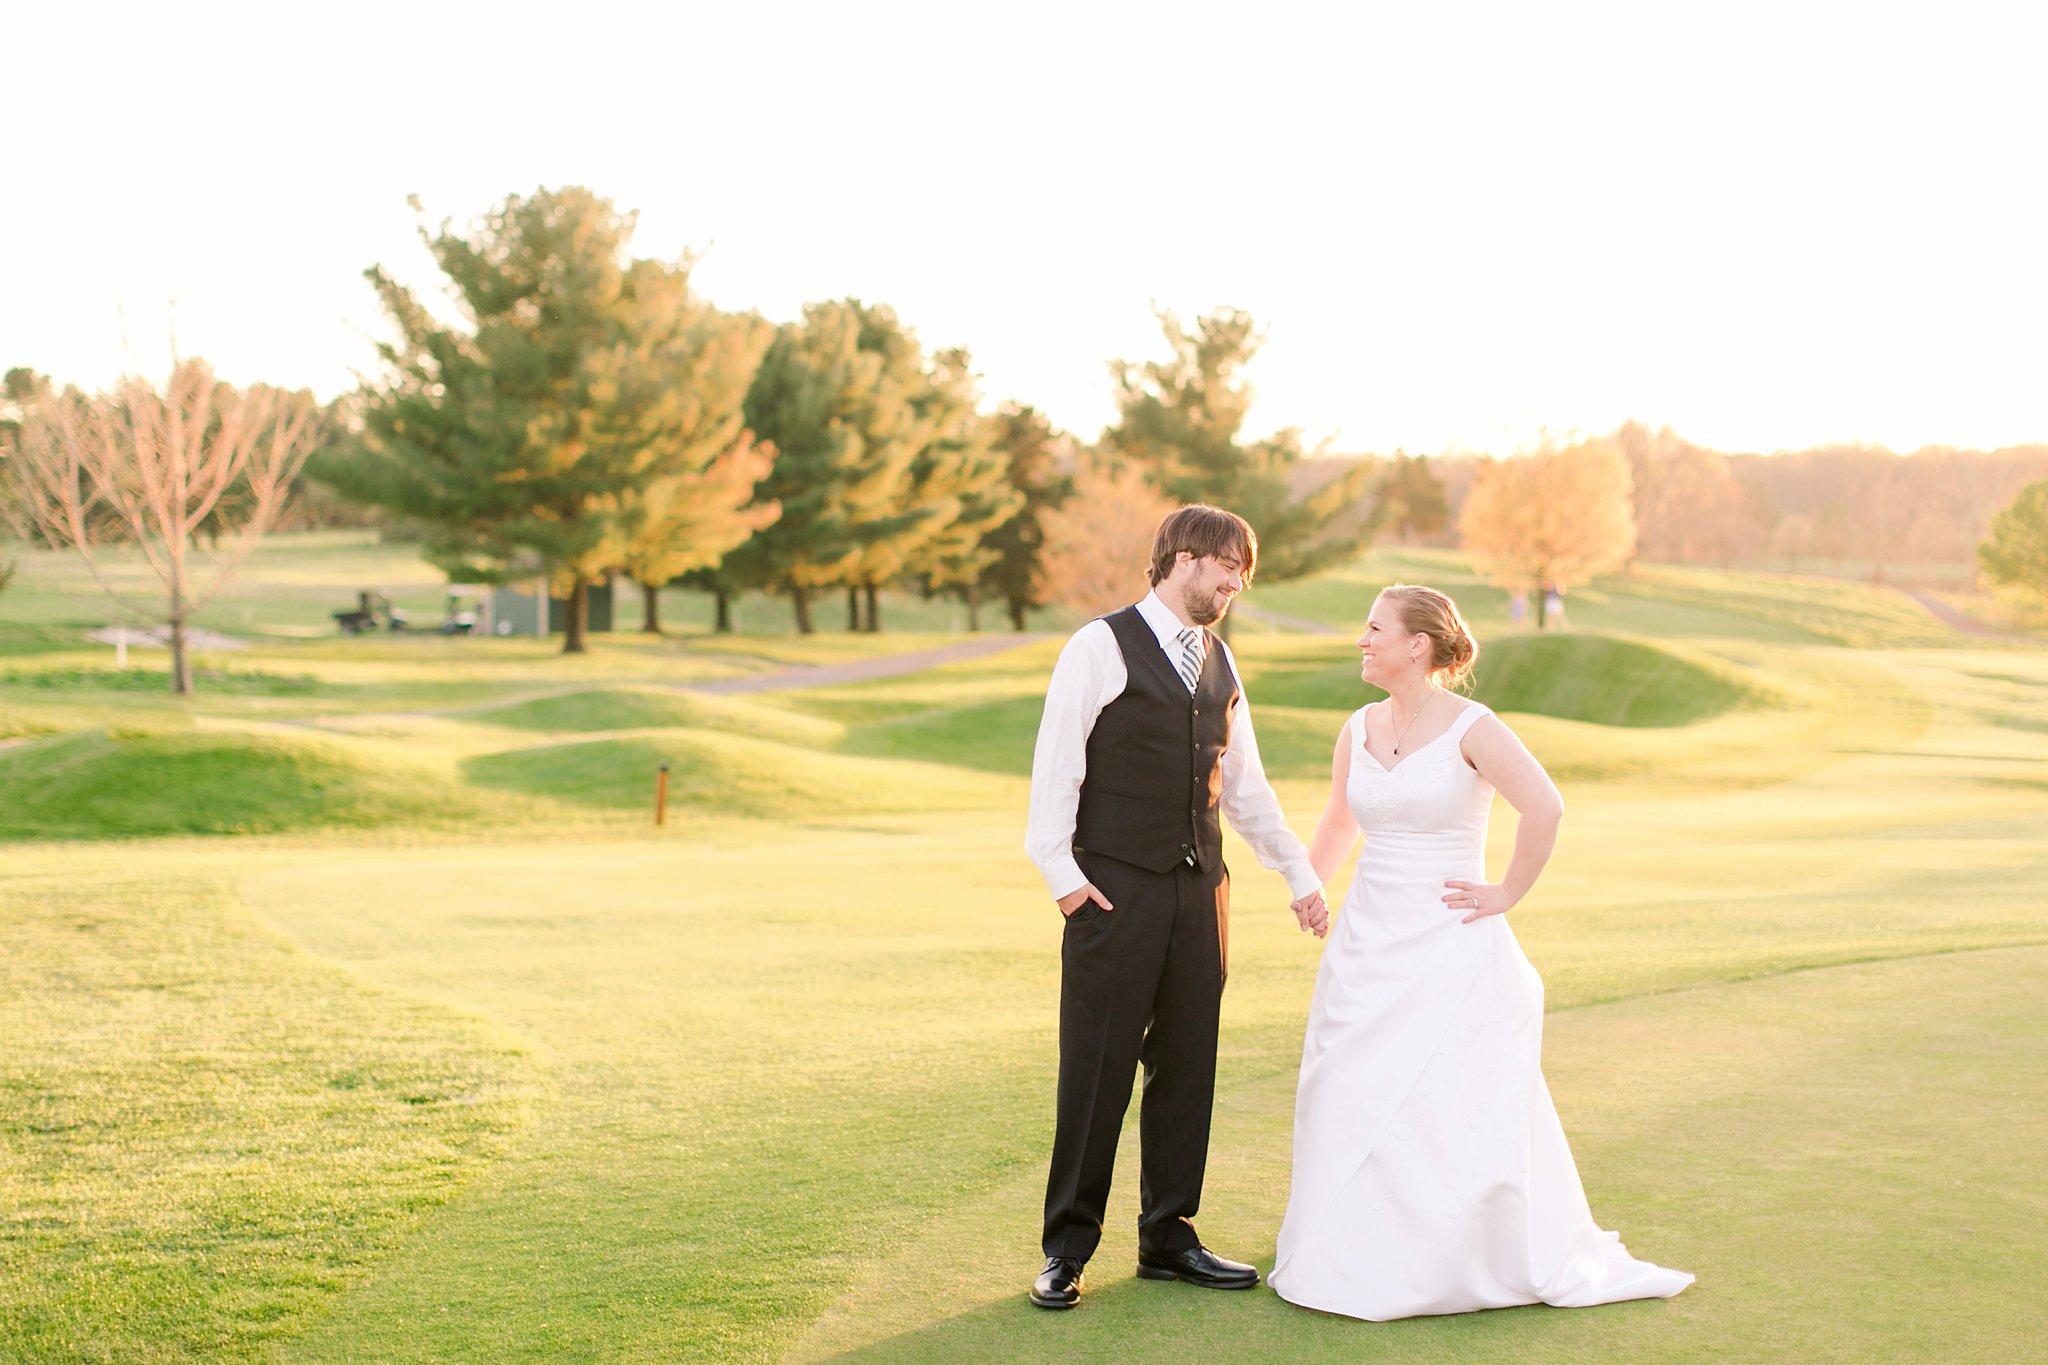 Chantilly National Golf Club Wedding Photos Virginia Wedding Photographer Megan Kelsey Photography Mary Beth and Nathan-103.jpg